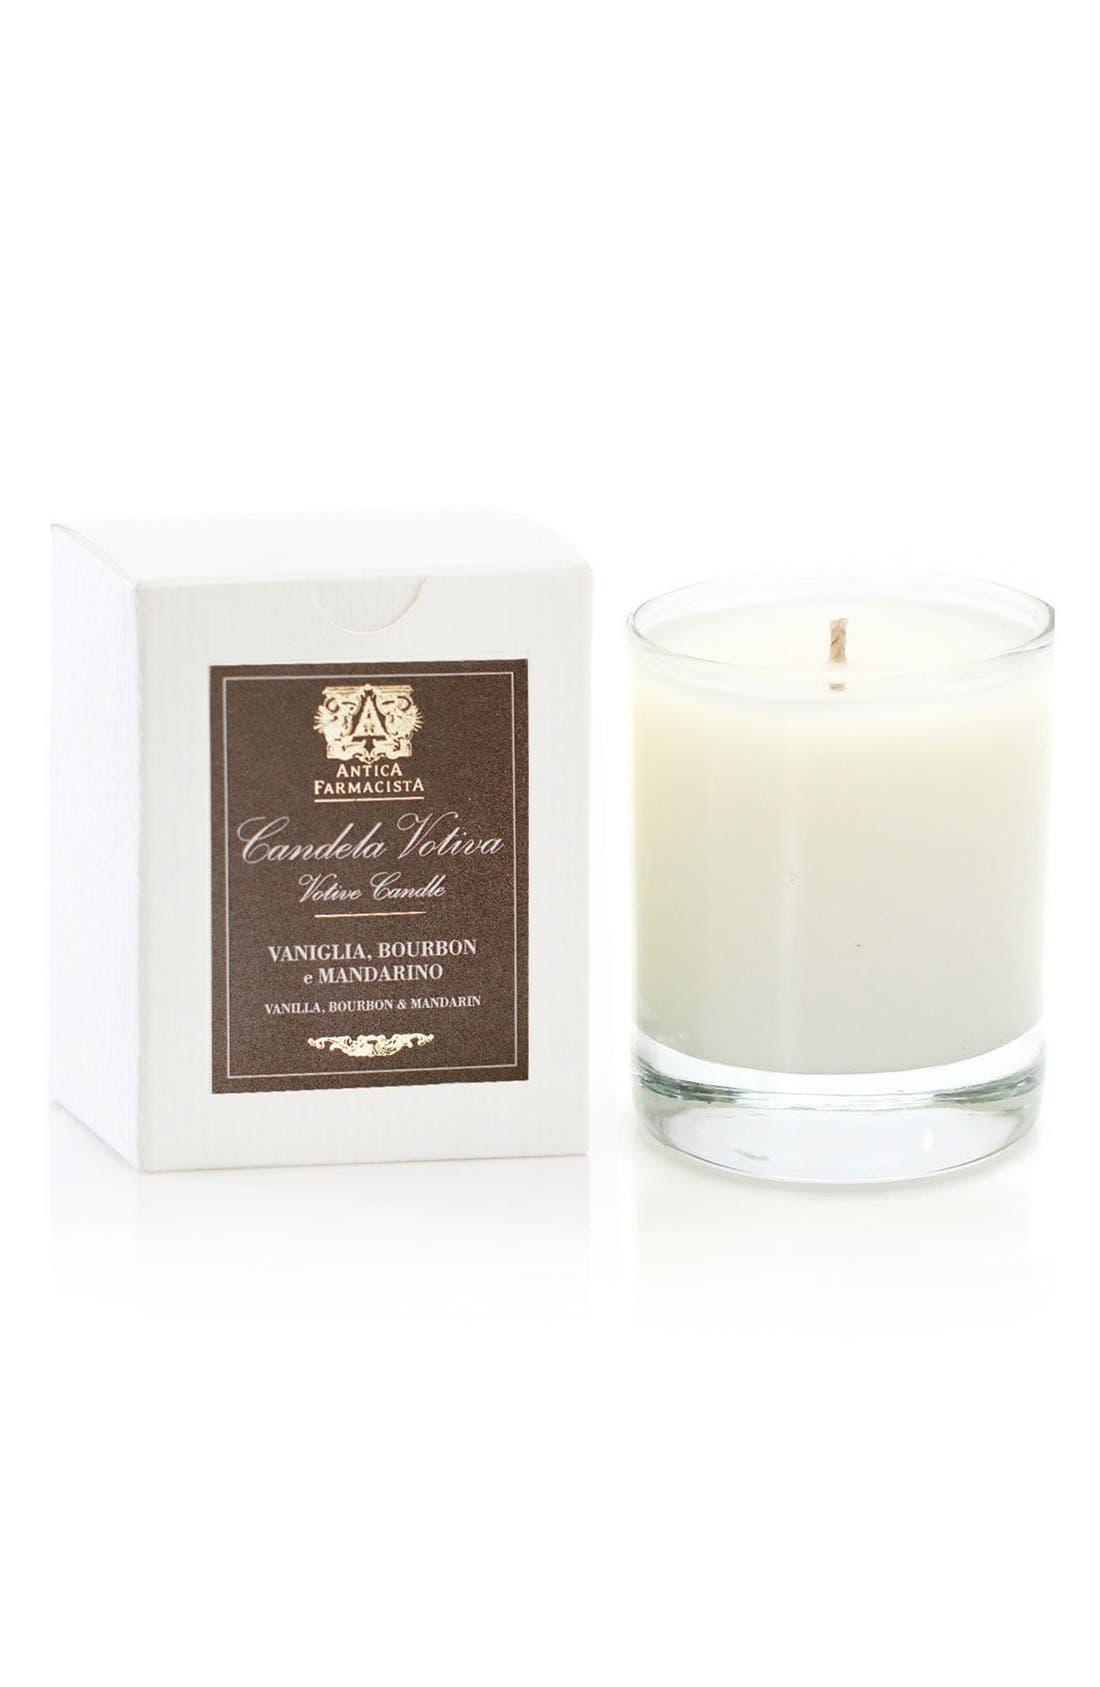 Alternate Image 1 Selected - Antica Farmacista Vanilla, Bourbon & Mandarin Votive Candle